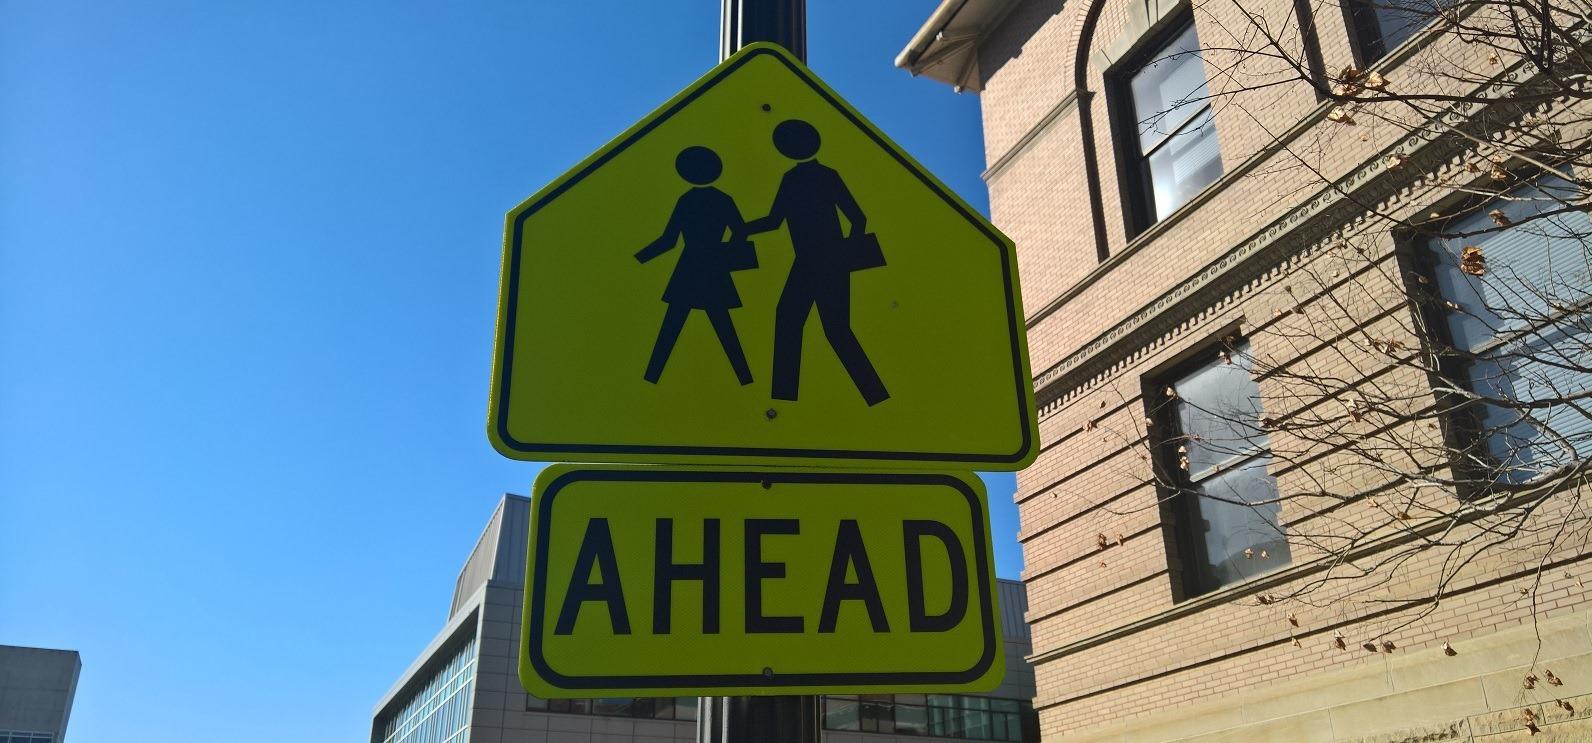 street-sign-osu